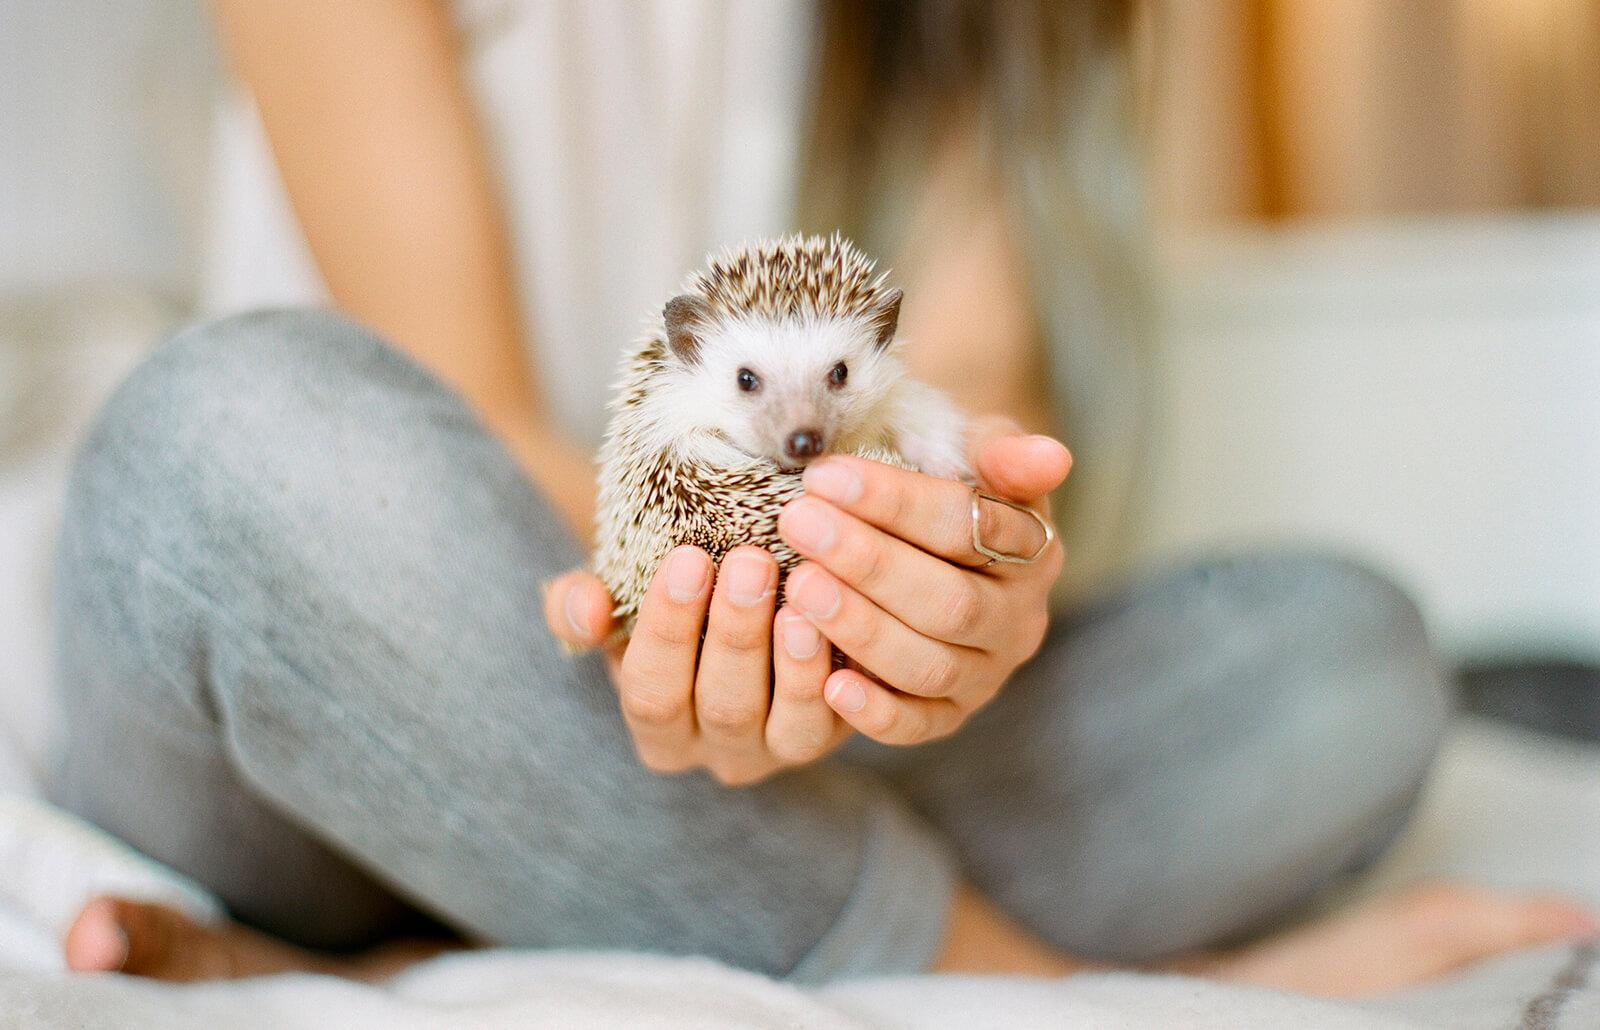 150 Pet Hedgehog Name Ideas   LoveToKnow